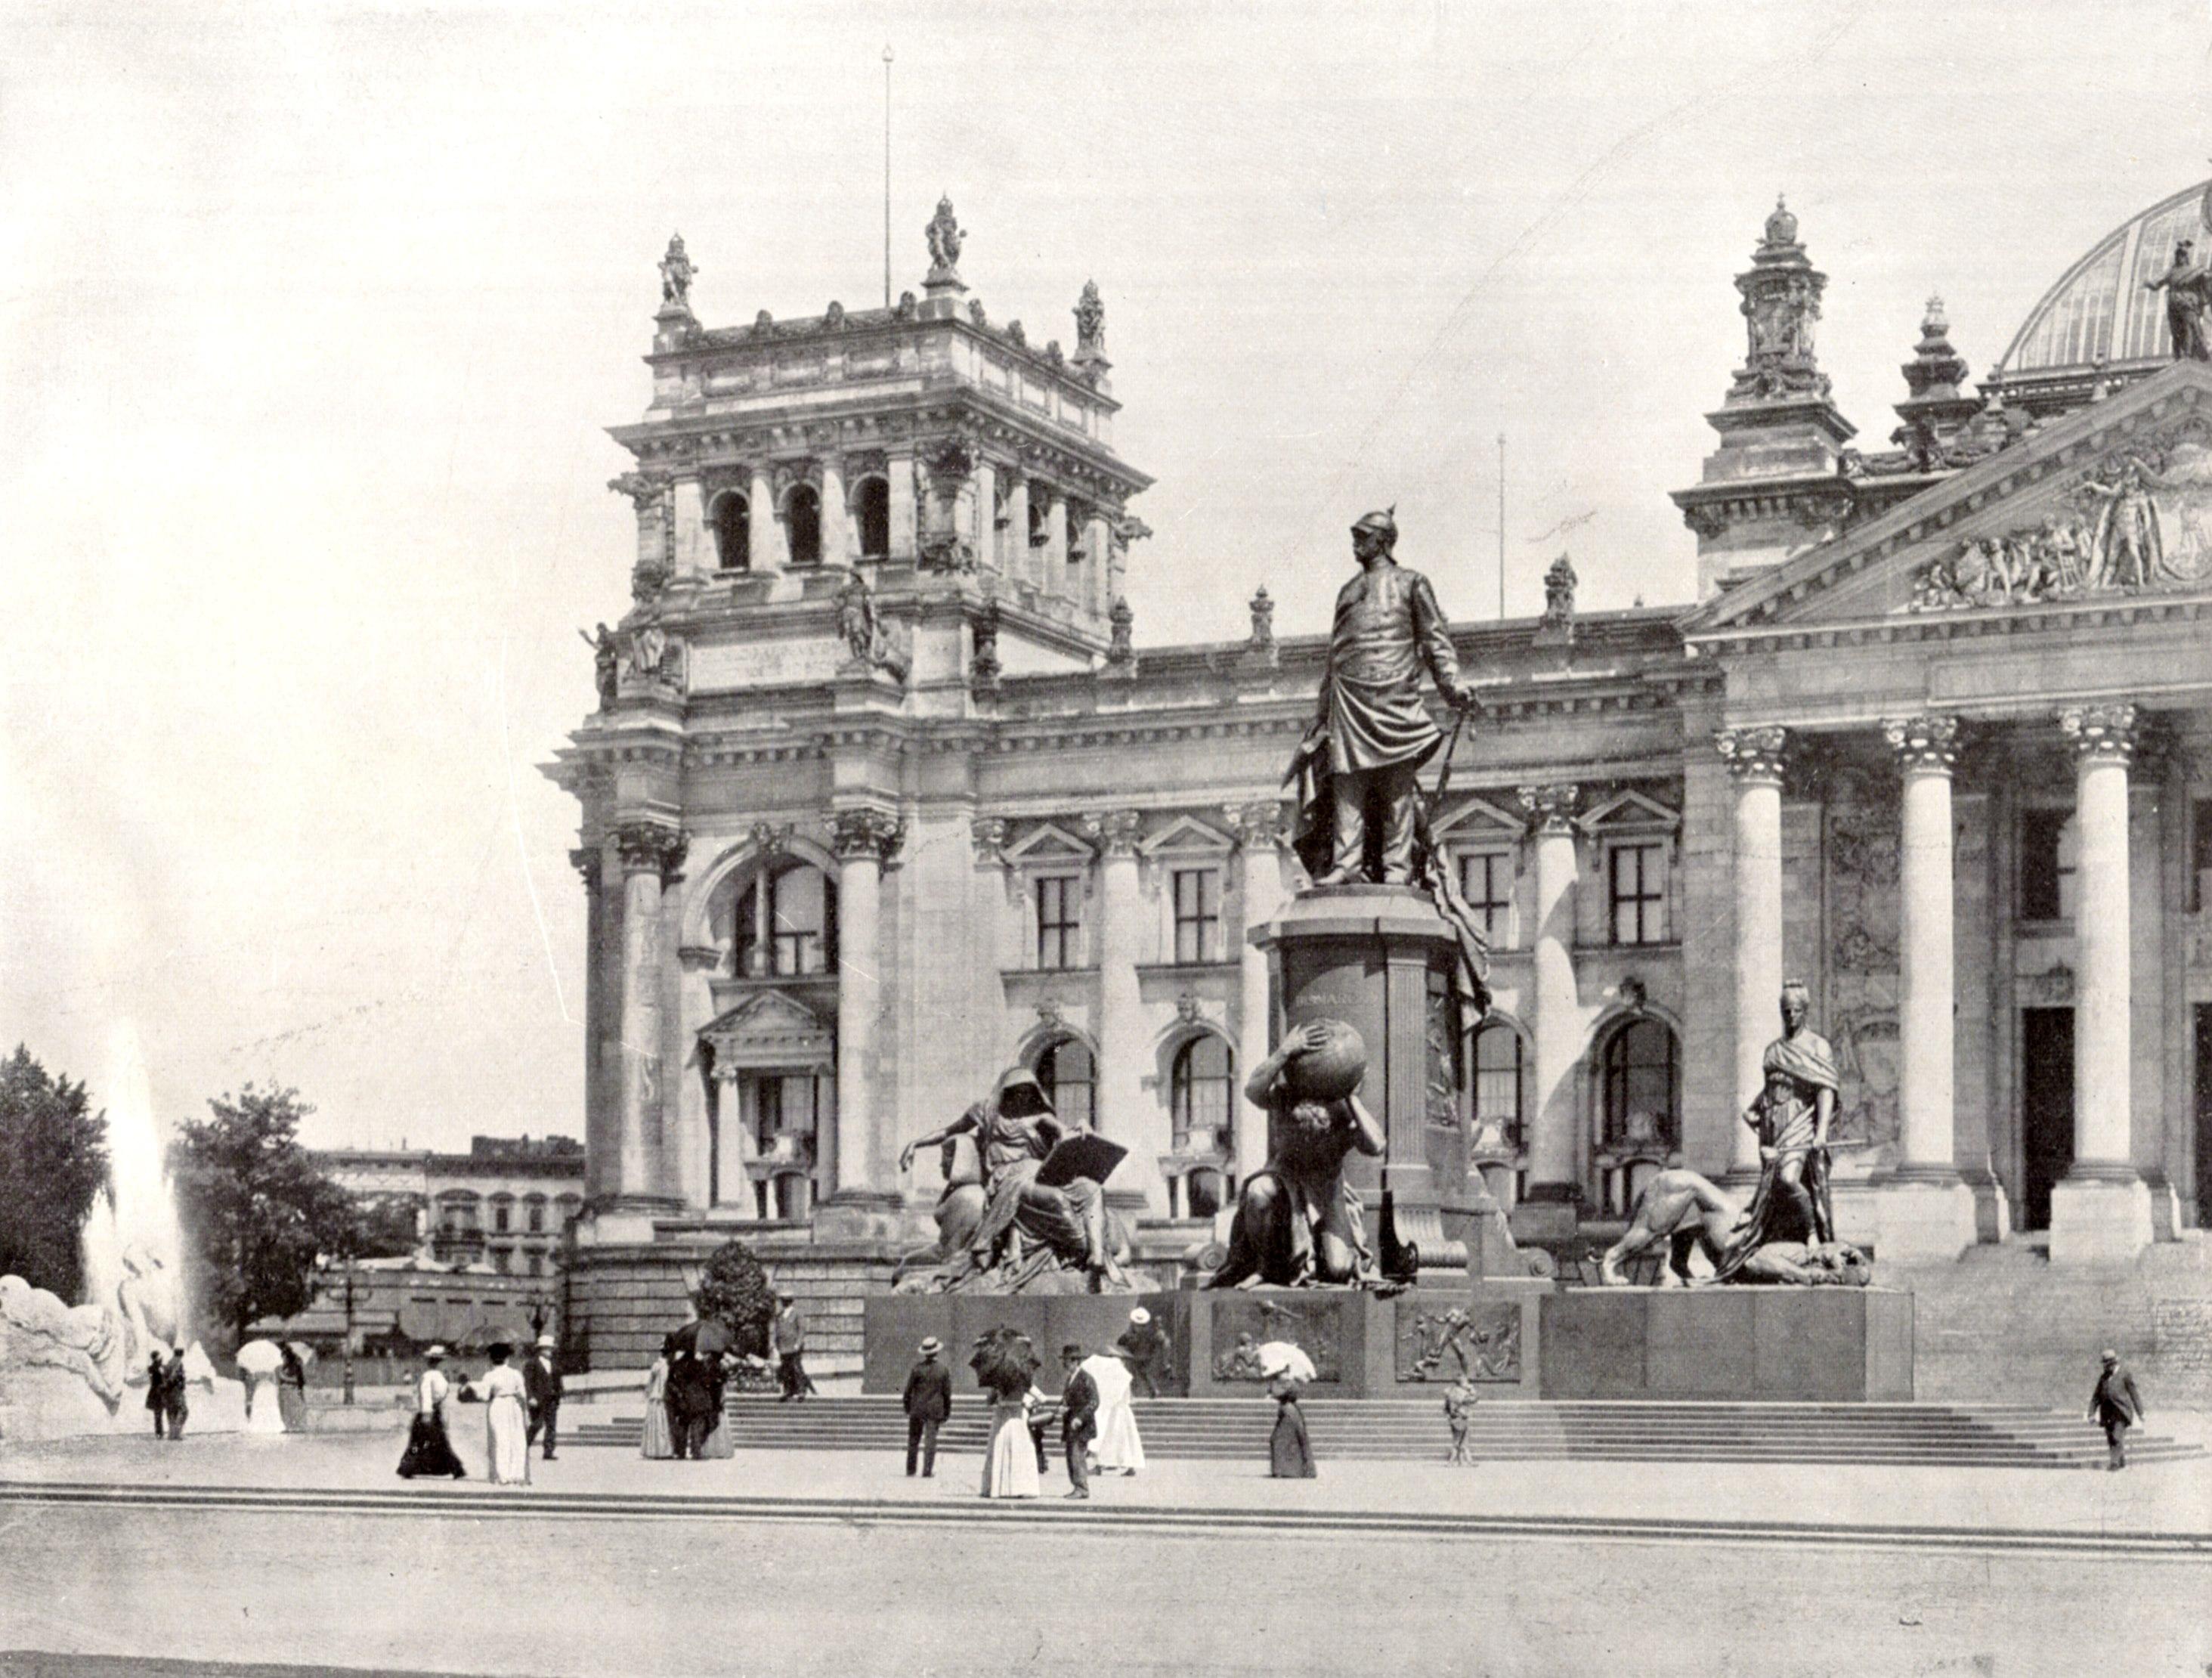 Bismarck Denkmal Berlin File:berlin Bismarck Denkmal